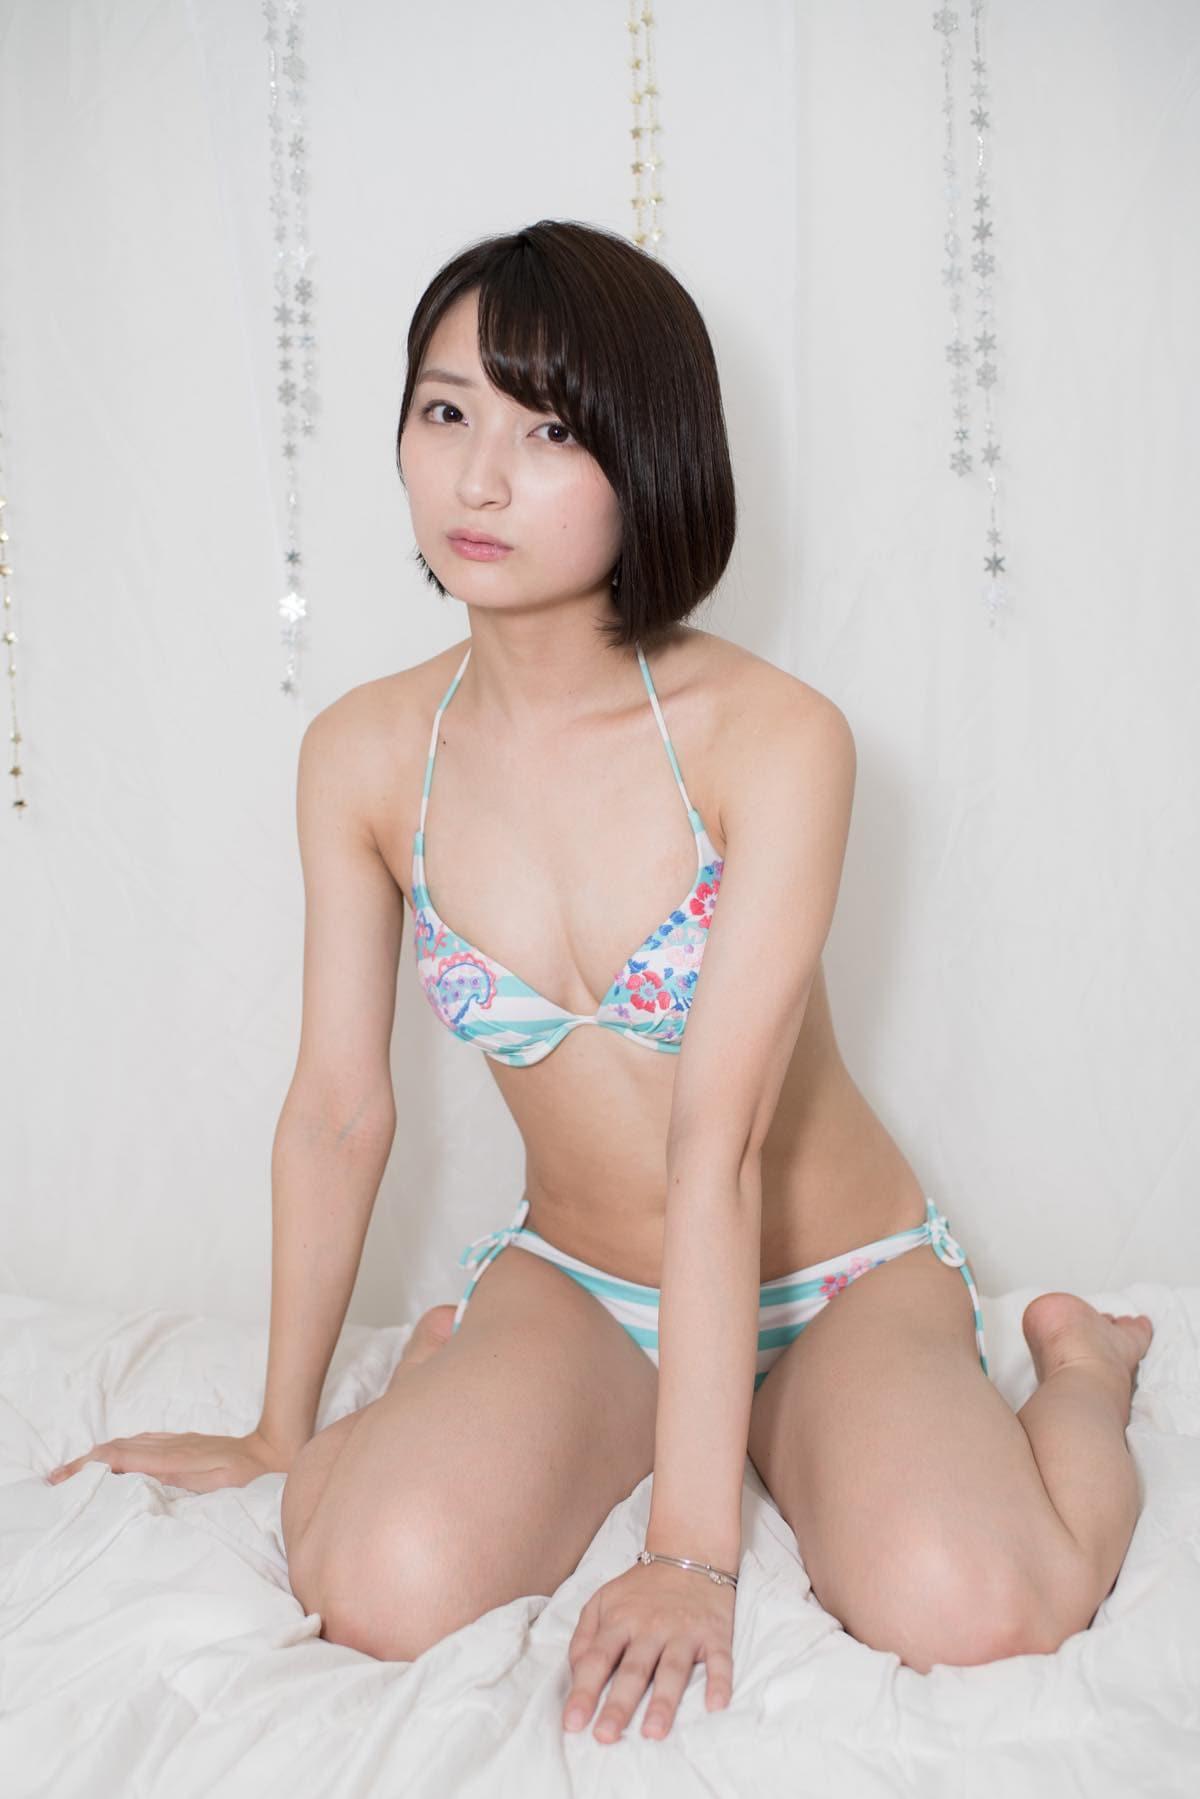 【宇佐美彩乃】東京Lily×EXwebコラボ企画 優秀作品発表!【写真10枚】の画像008